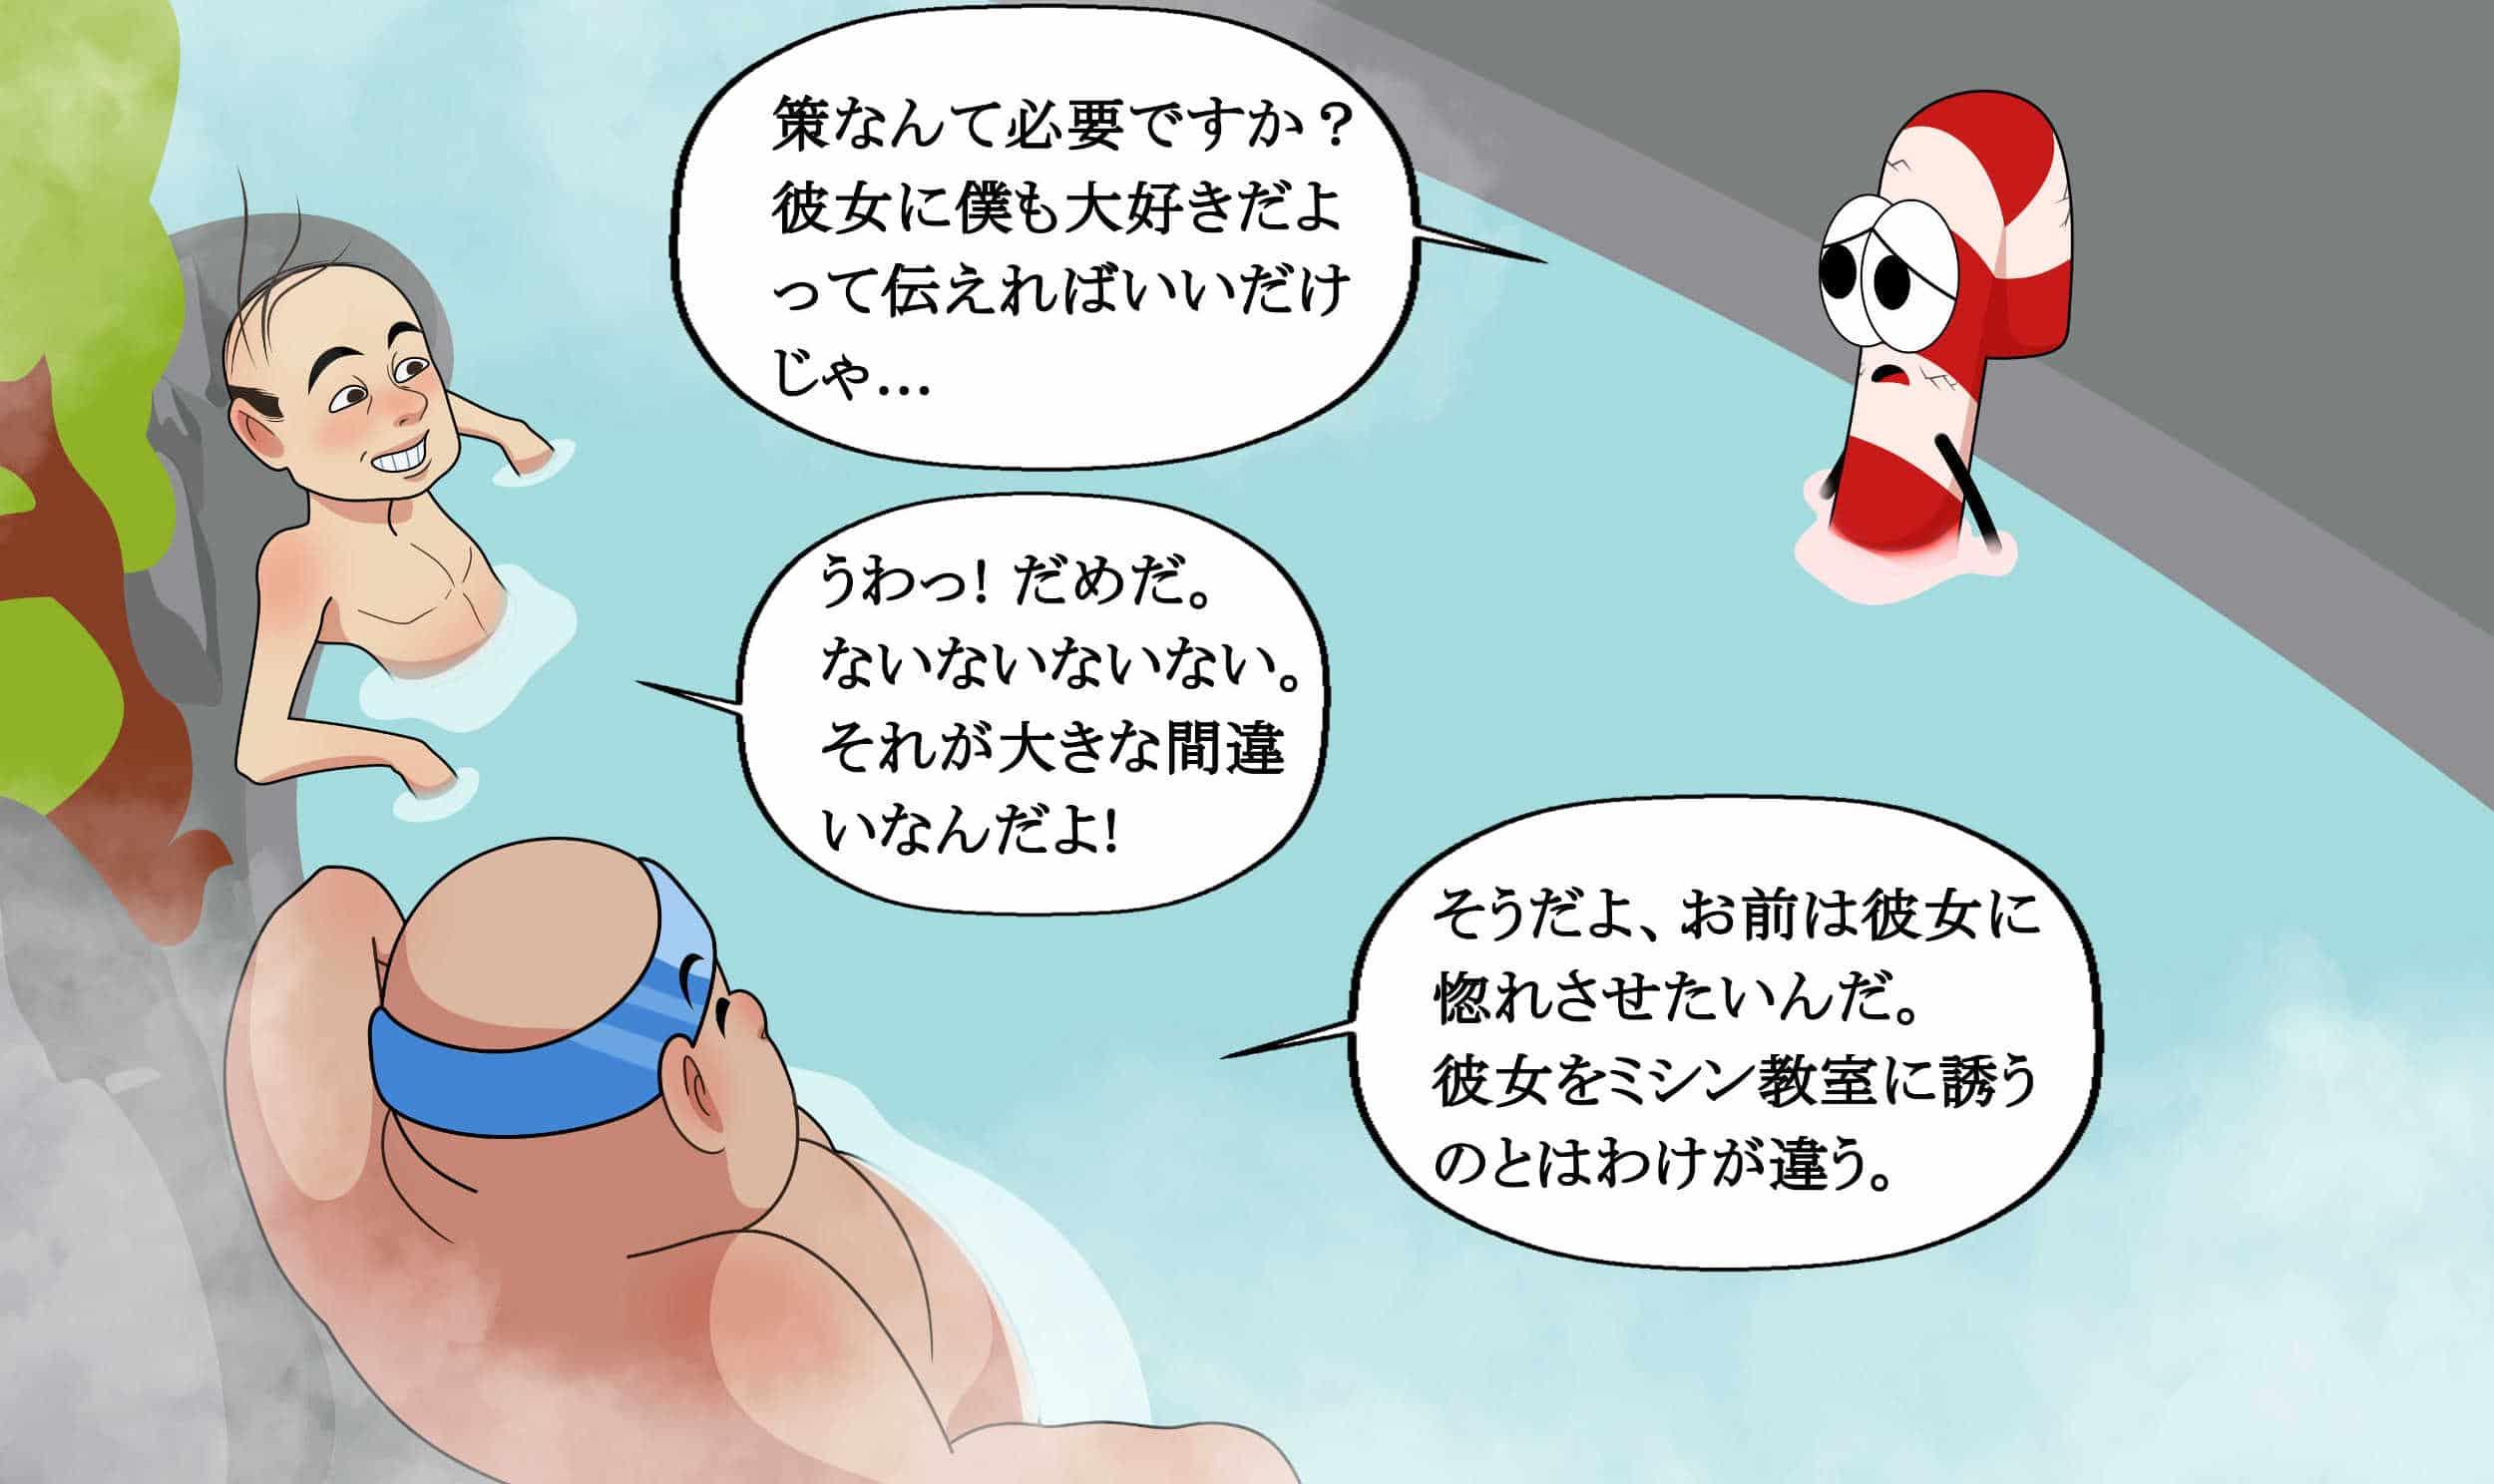 Onsen_46 (repeat)-min.jpg